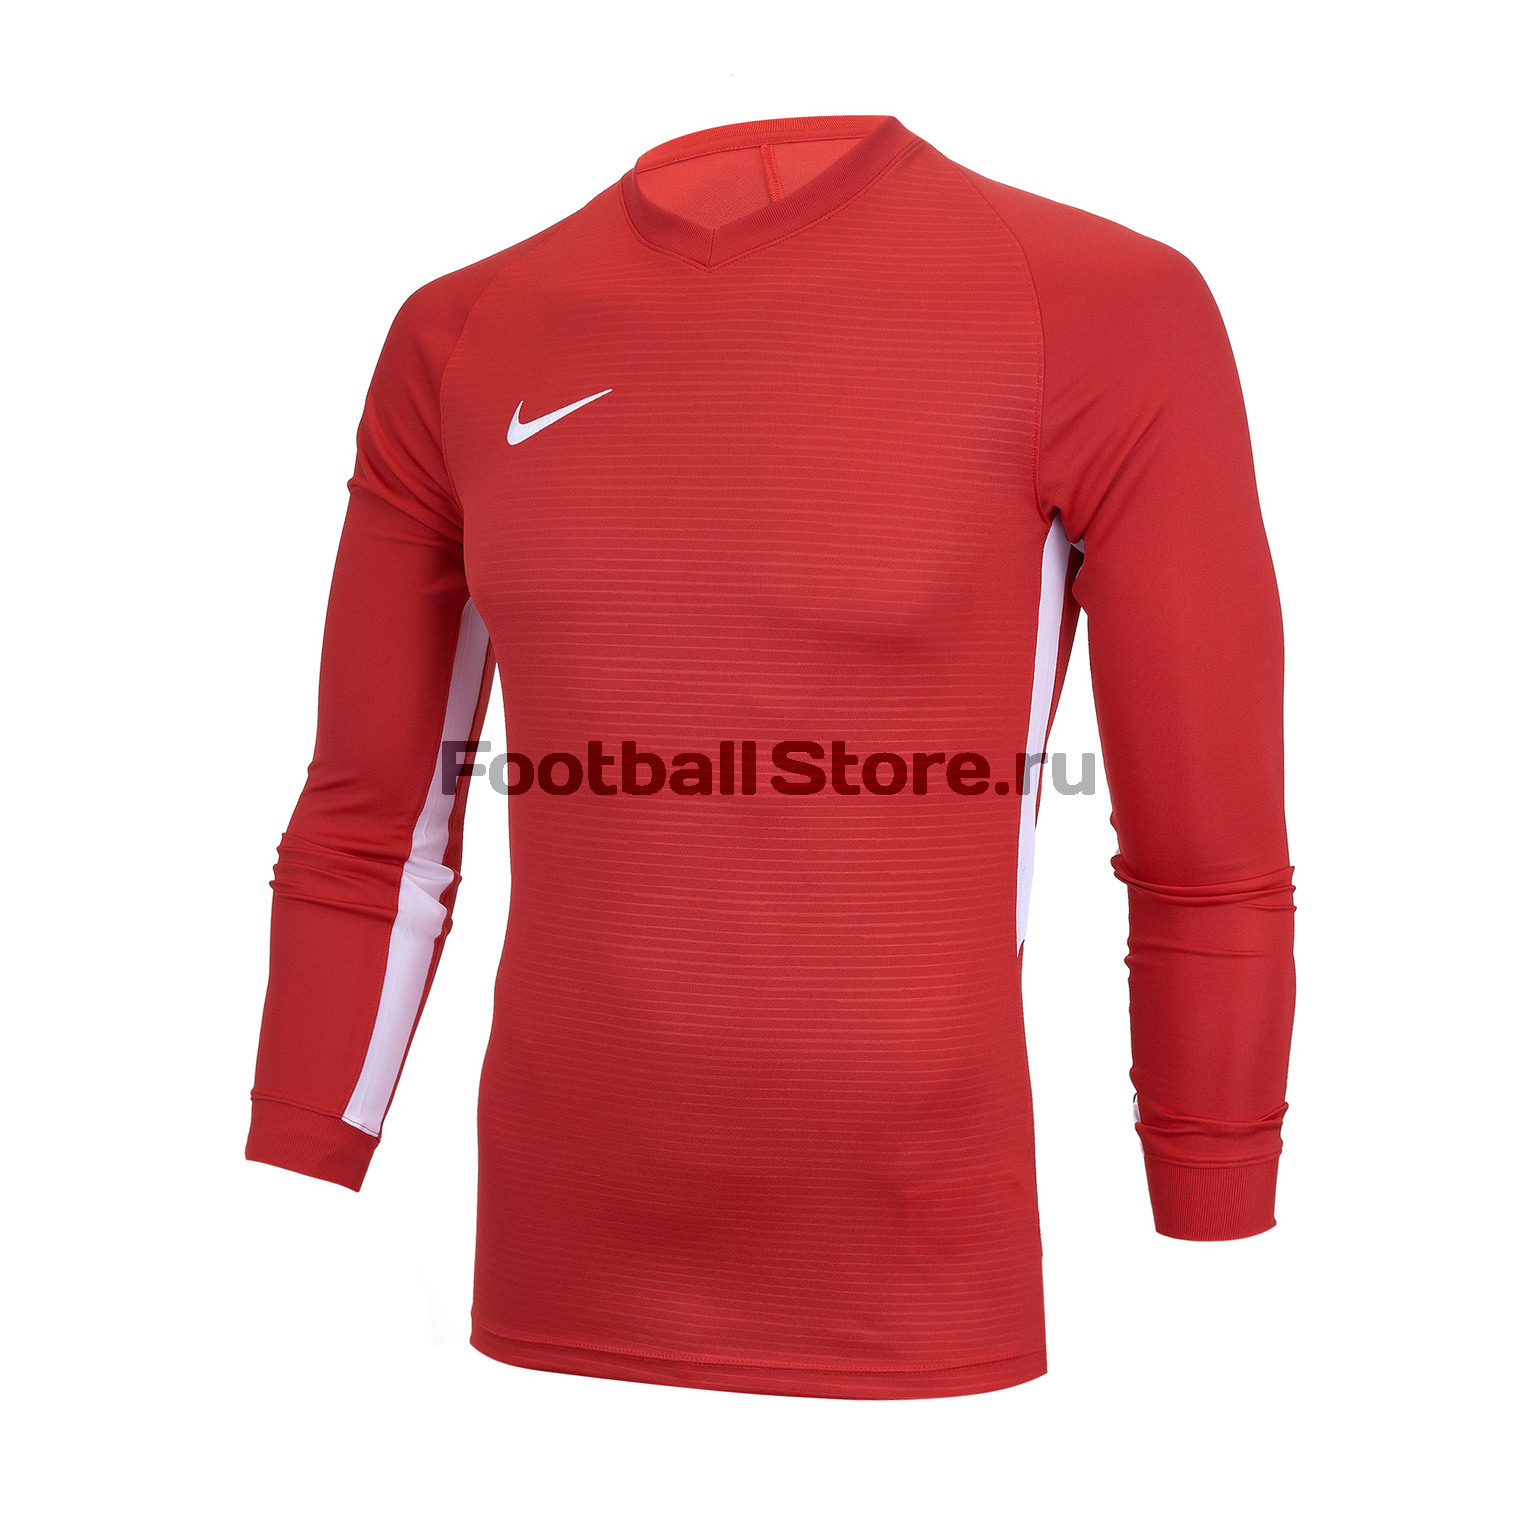 Футболка игровая Nike Dry Tiempo Prem JSY LS 894248-657 футболка игровая nike dry tiempo prem jsy ss 894230 412